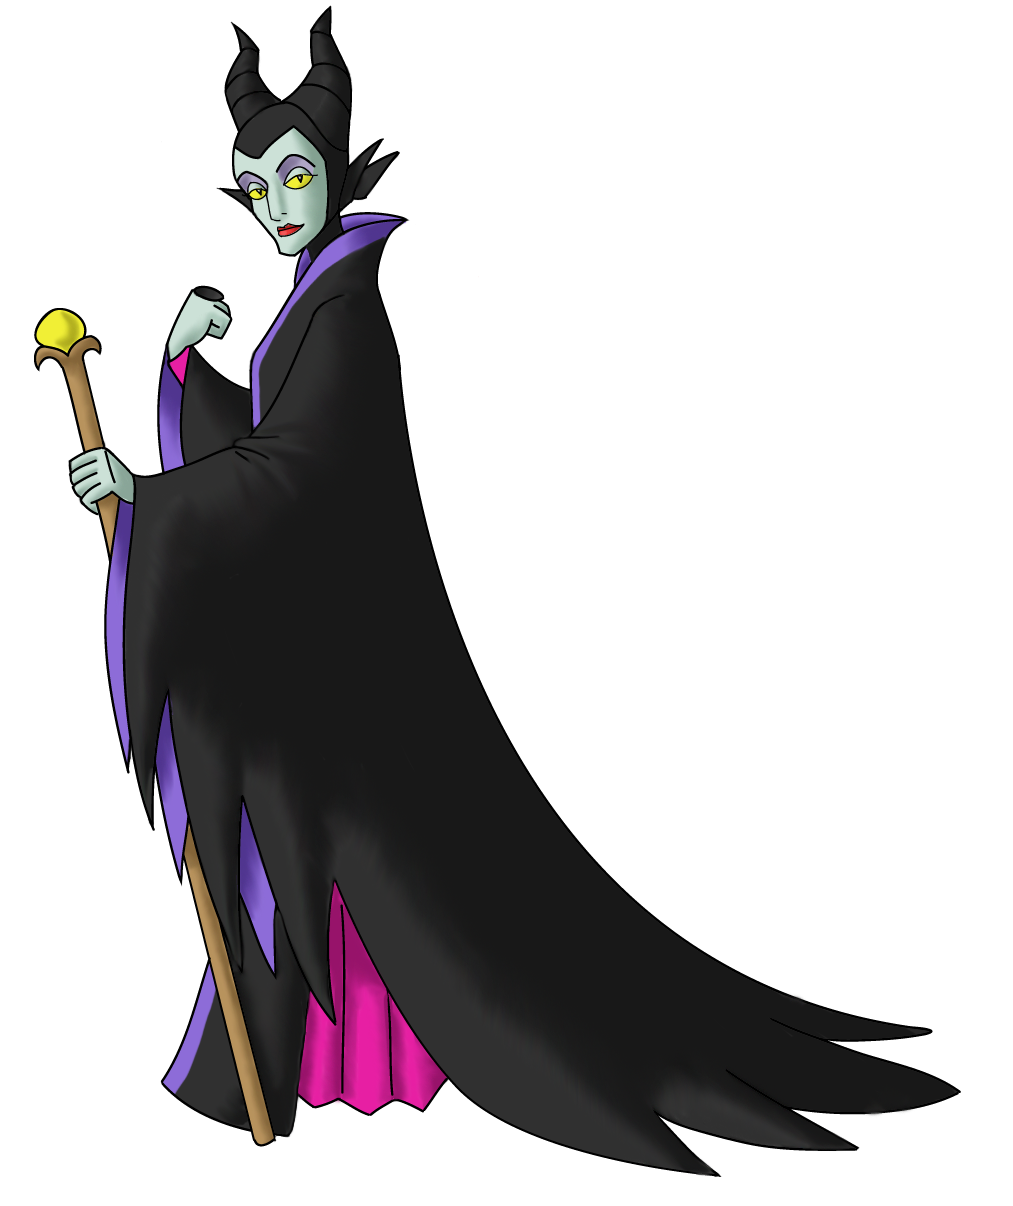 Disney Villain October 25: Maleficent by PowerOptix on ...